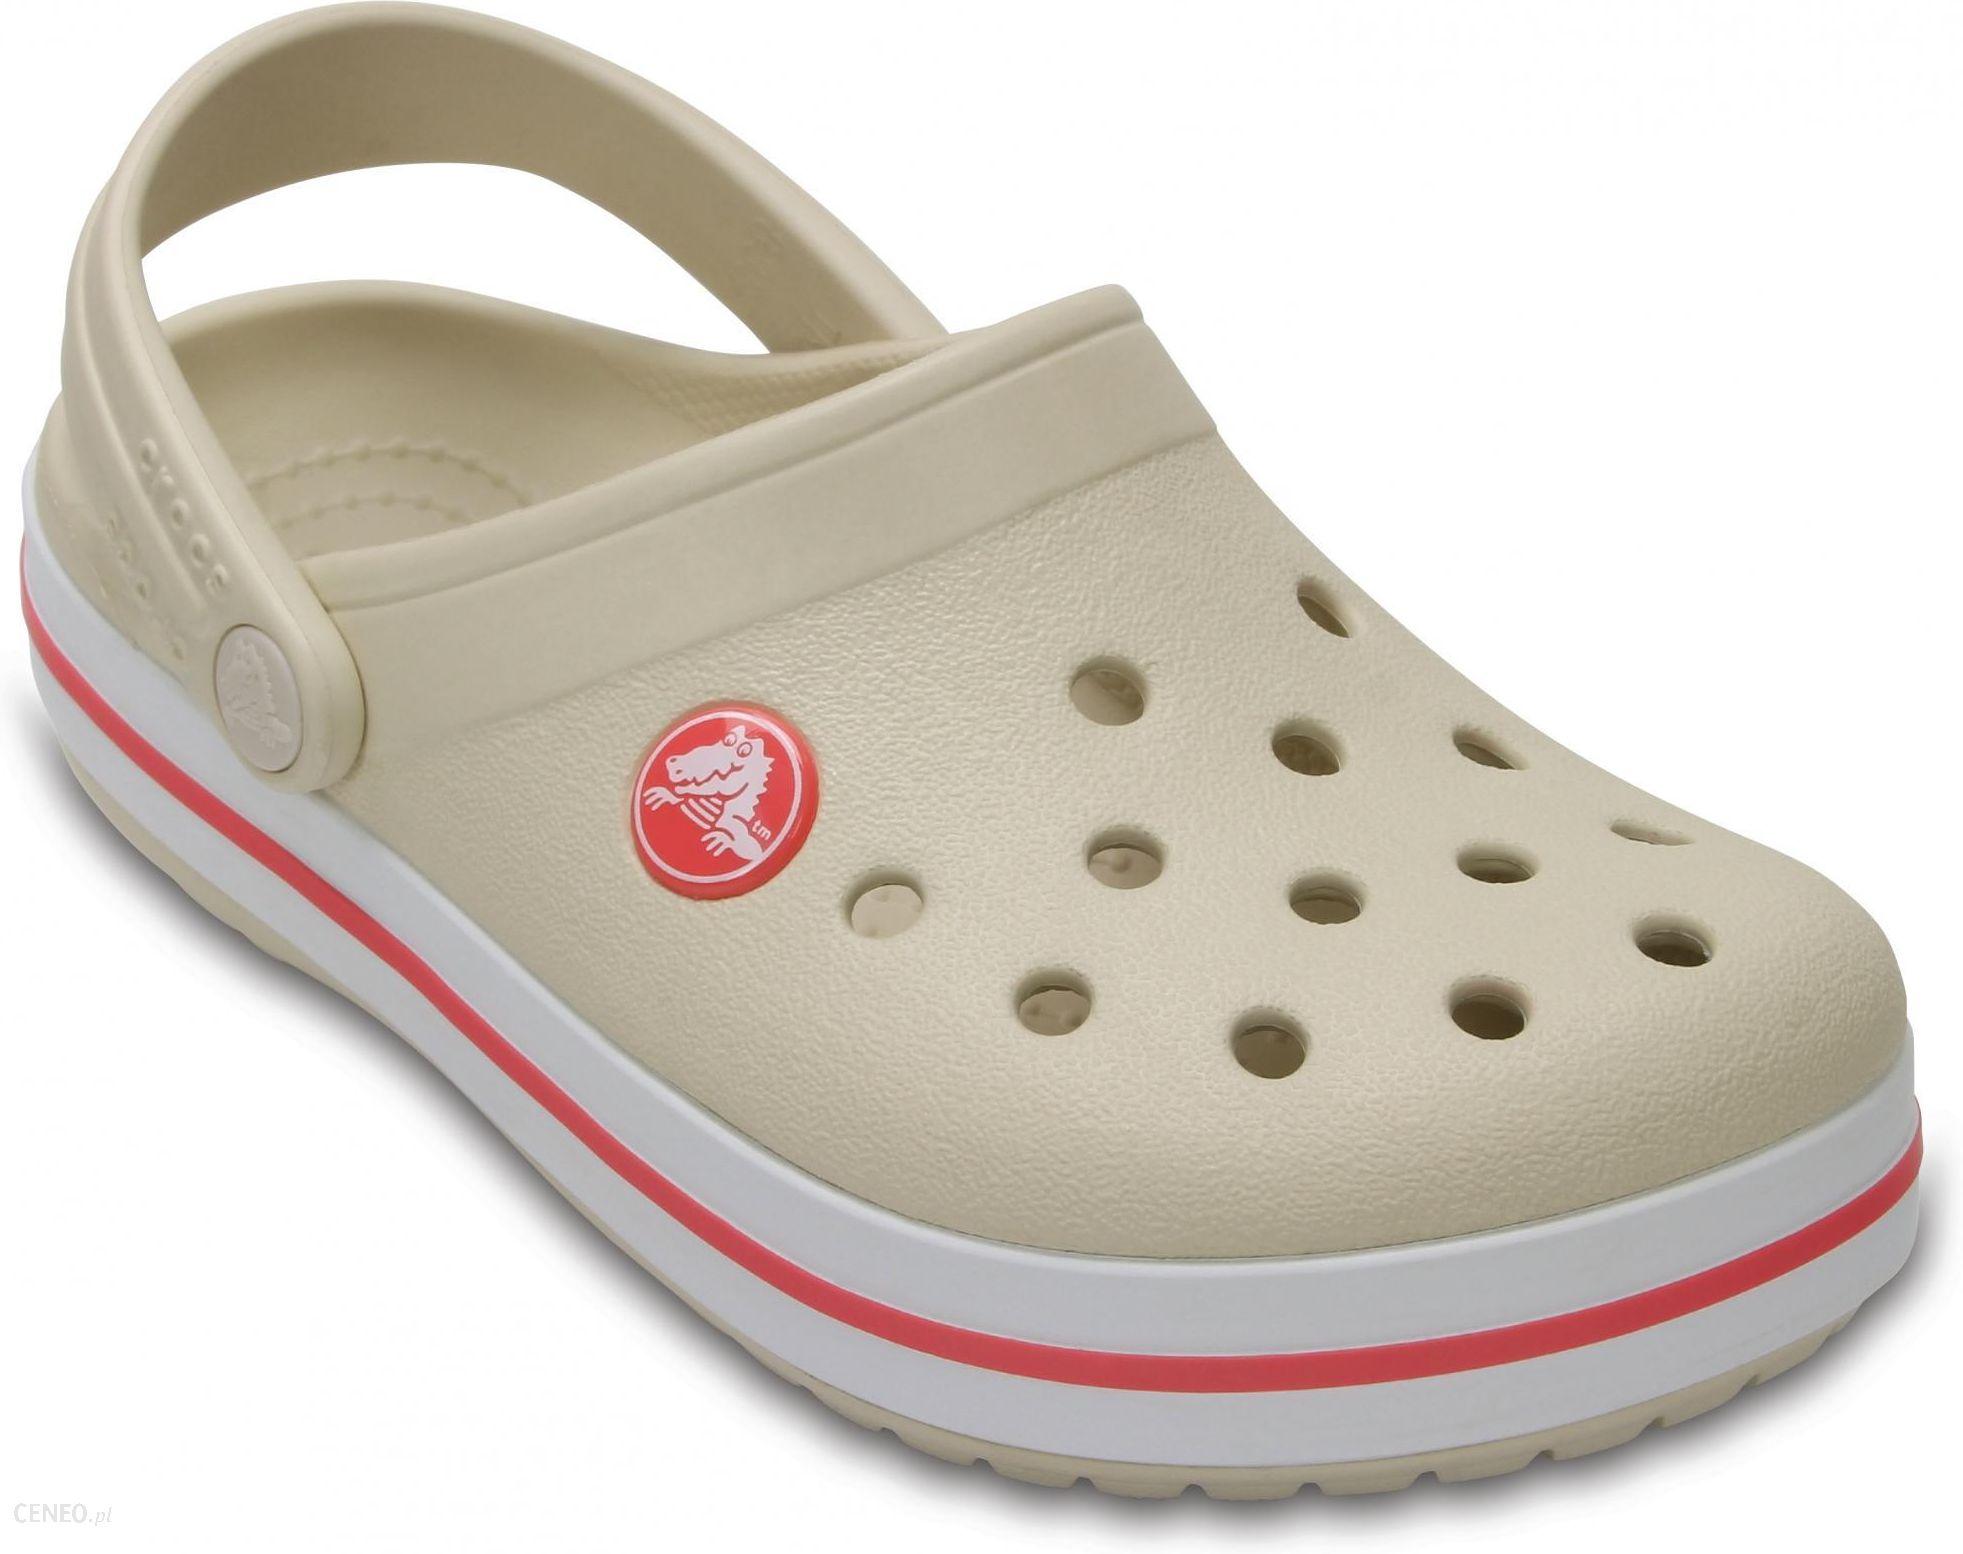 15b5ff83f2c5f Crocs Crocband Clog K Stucco/Melon 25.5 - Ceny i opinie - Ceneo.pl